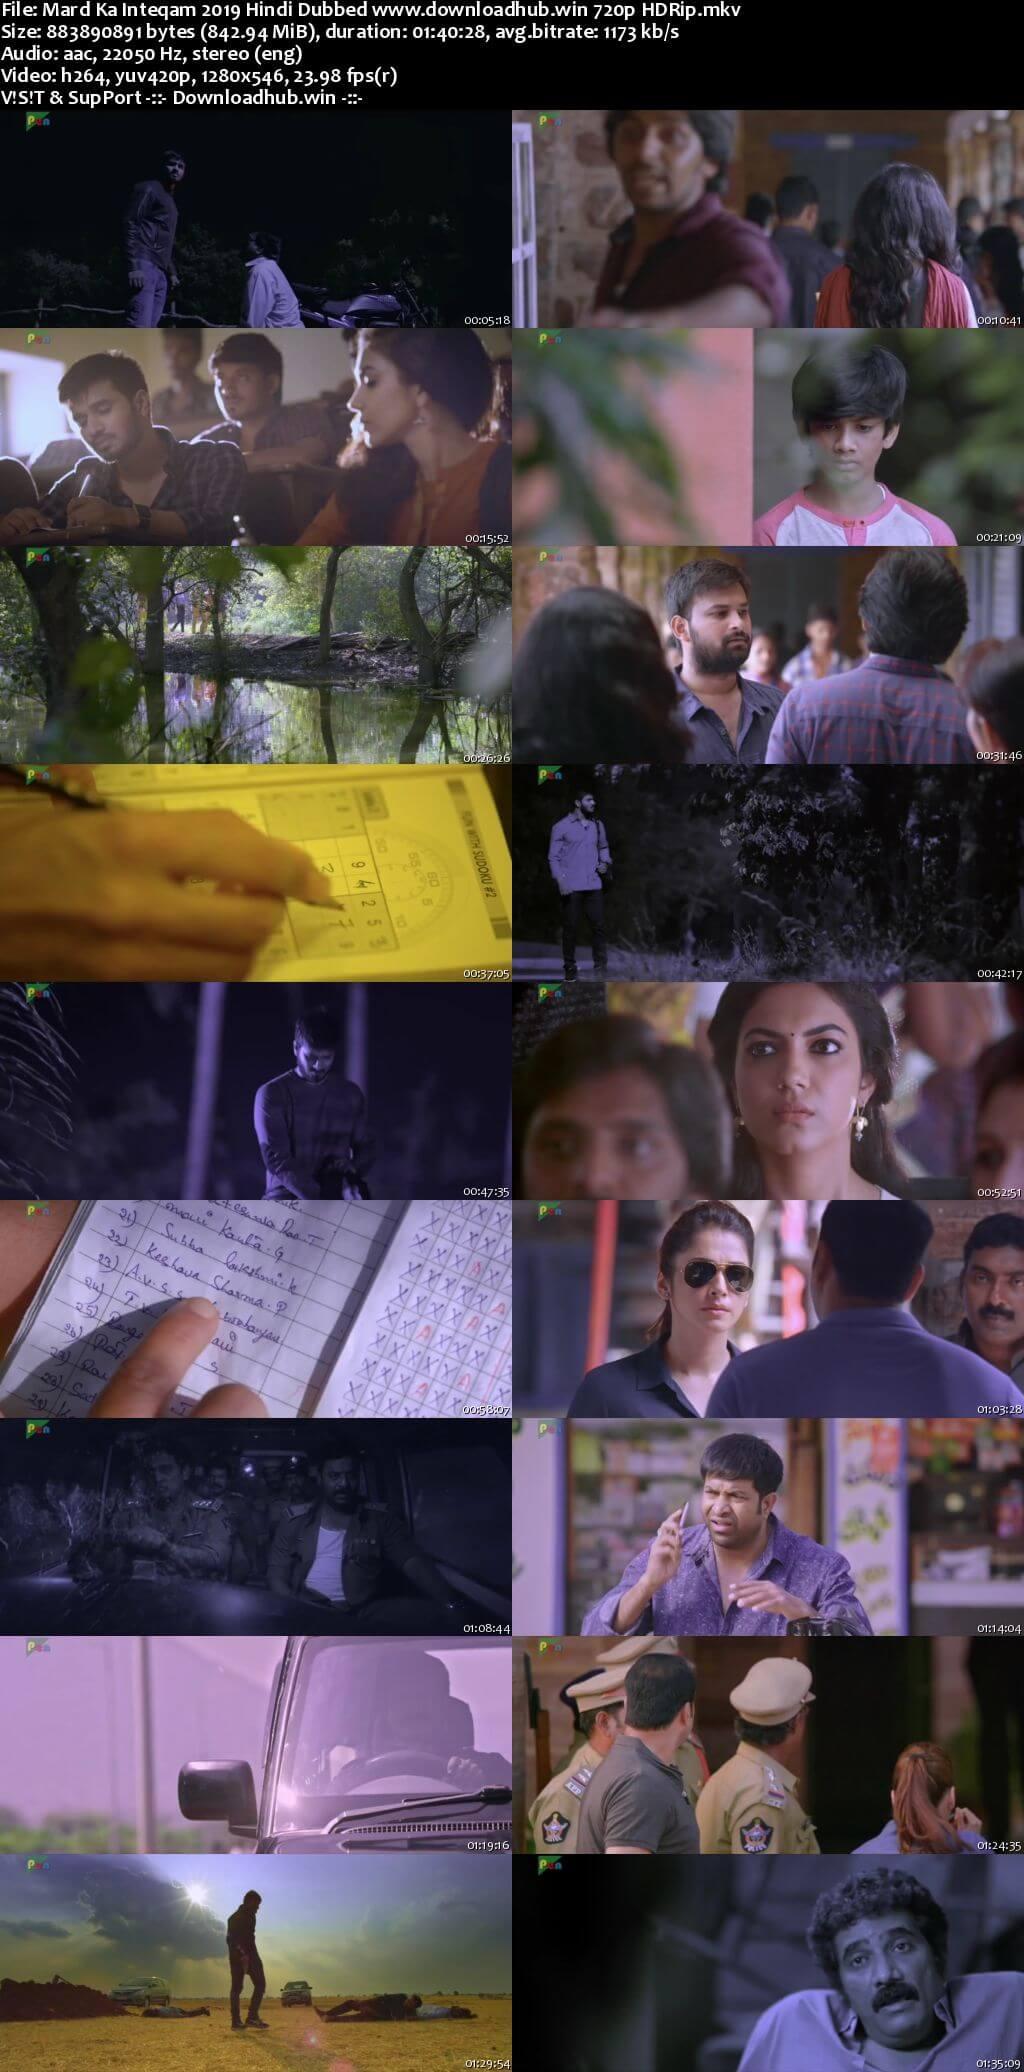 Mard Ka Inteqam 2019 Hindi Dubbed 720p HDRip x264